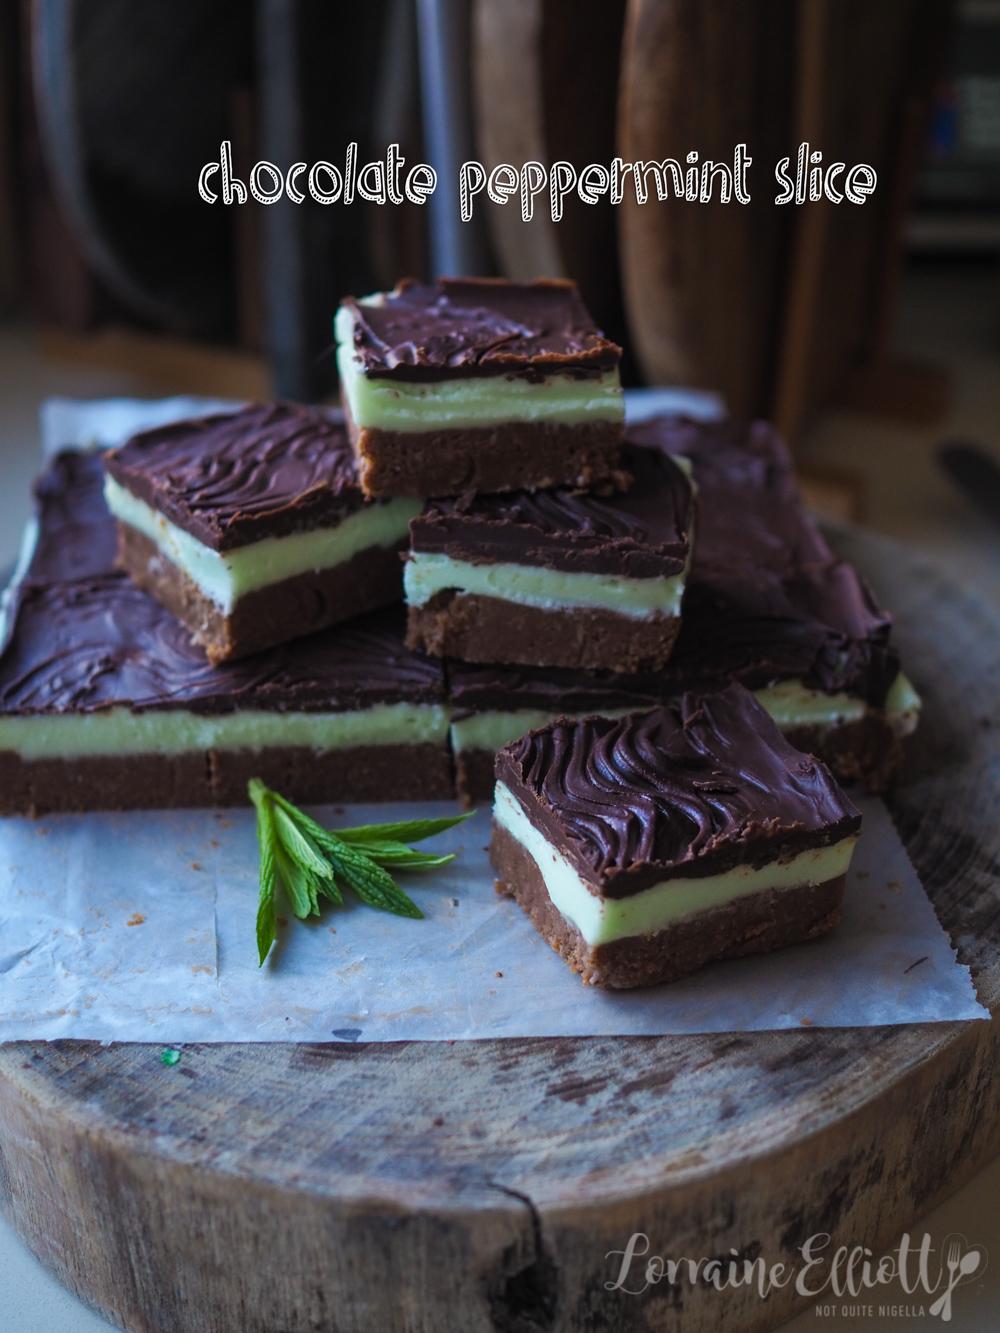 Chocolate Peppermint Slice